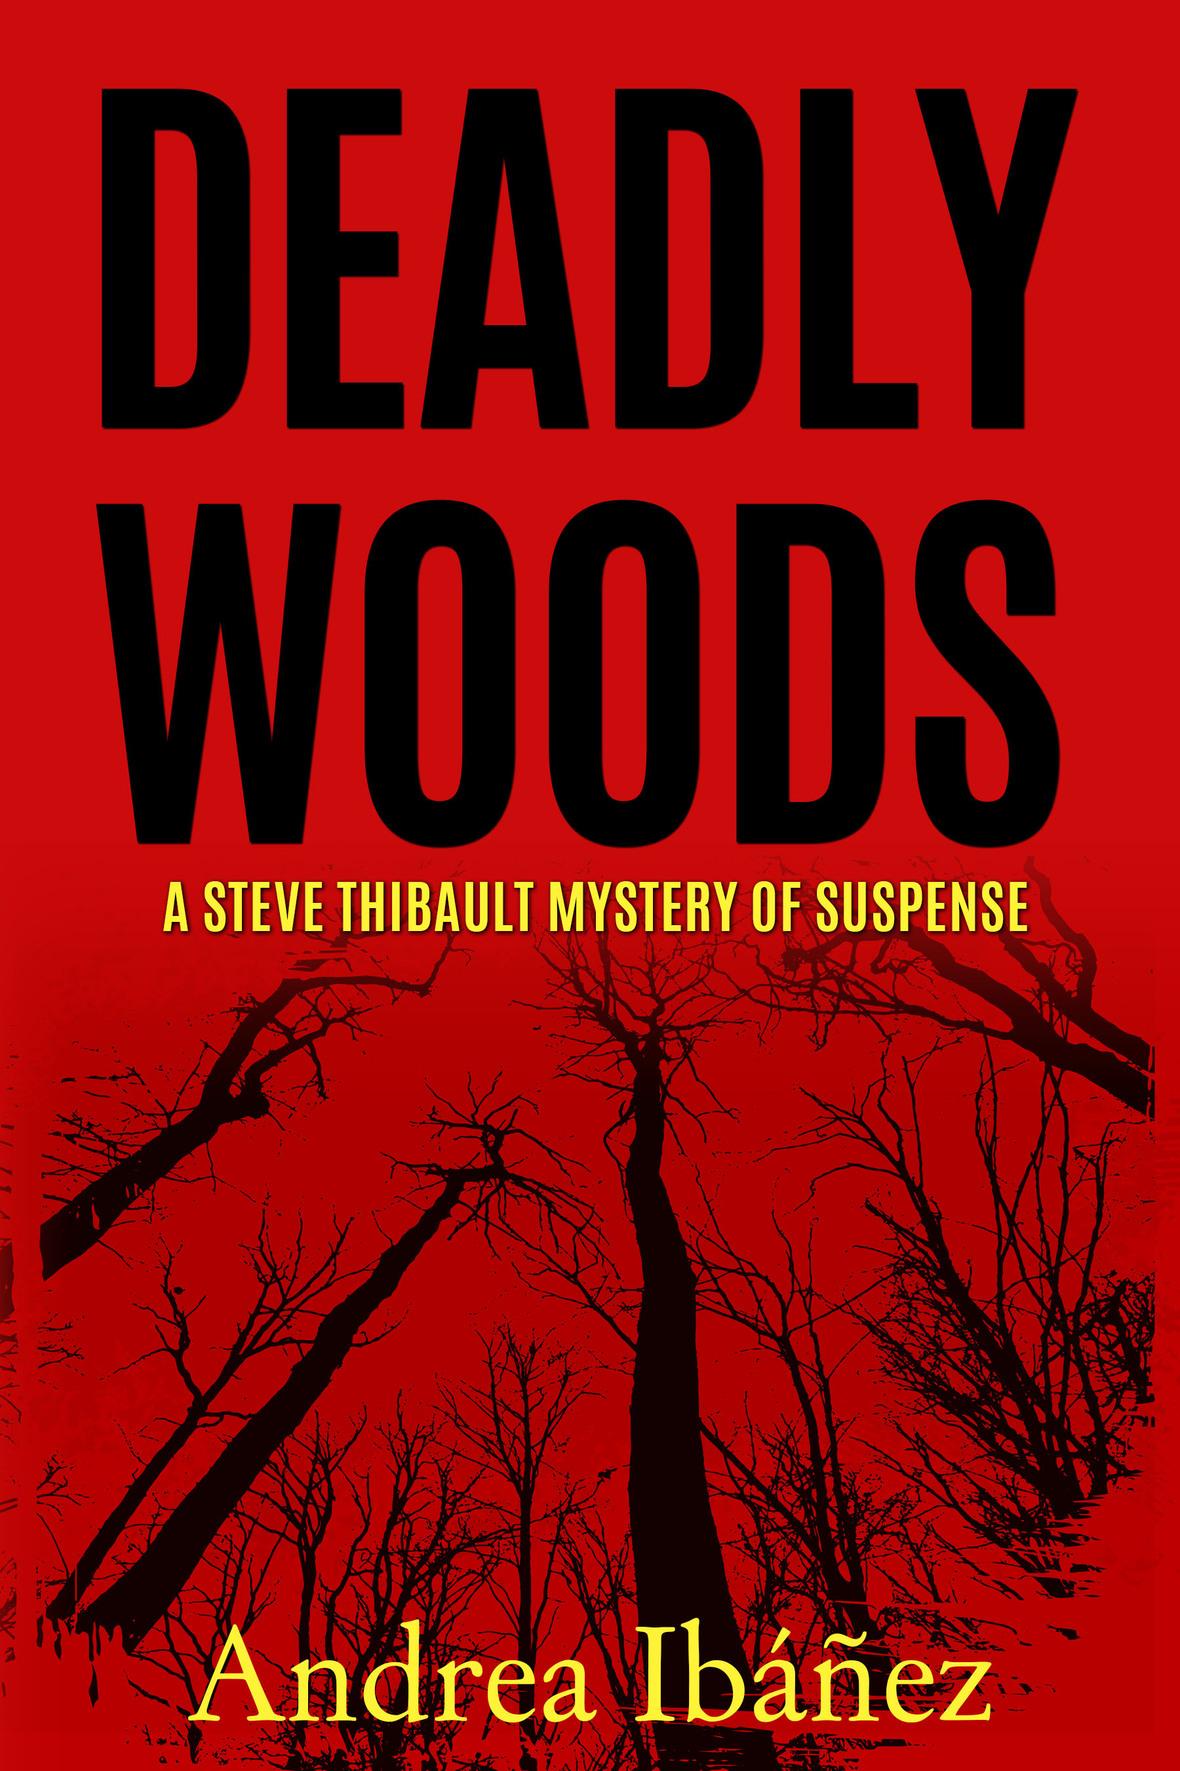 DeadlyWoodseBook-6